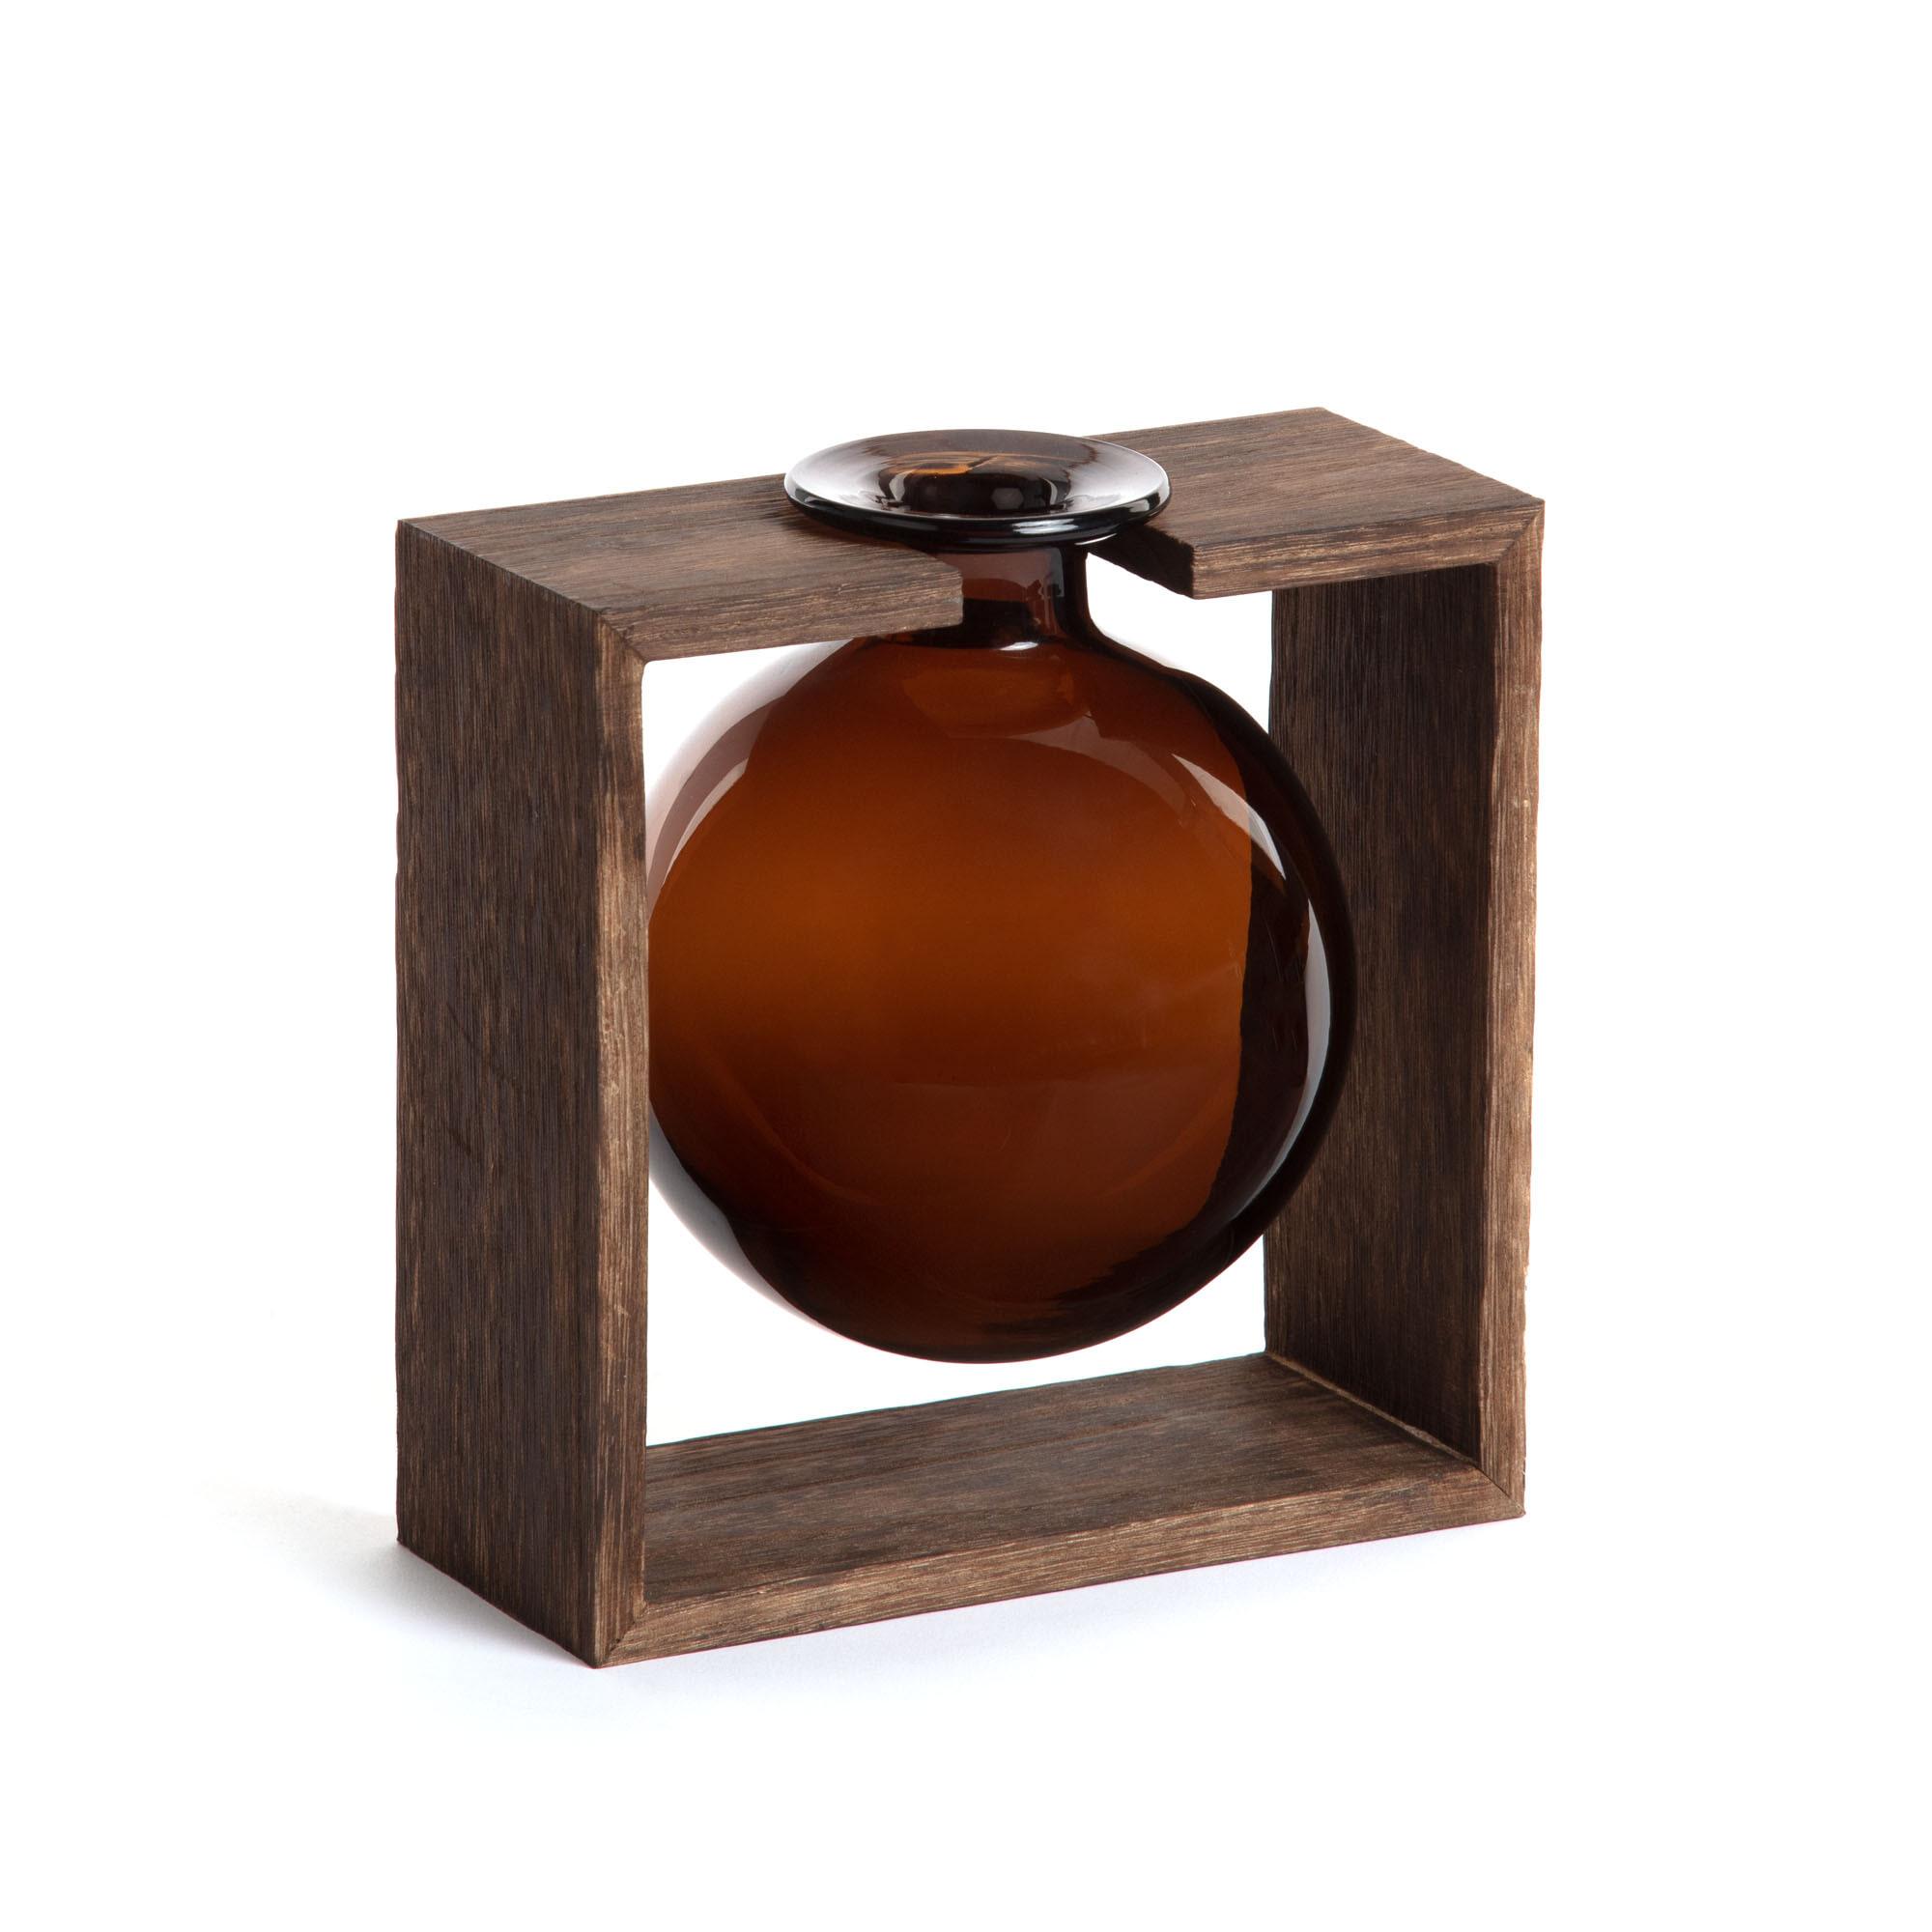 Kave Home Vaas 'Ademia' 20cm hoog, kleur Bruin